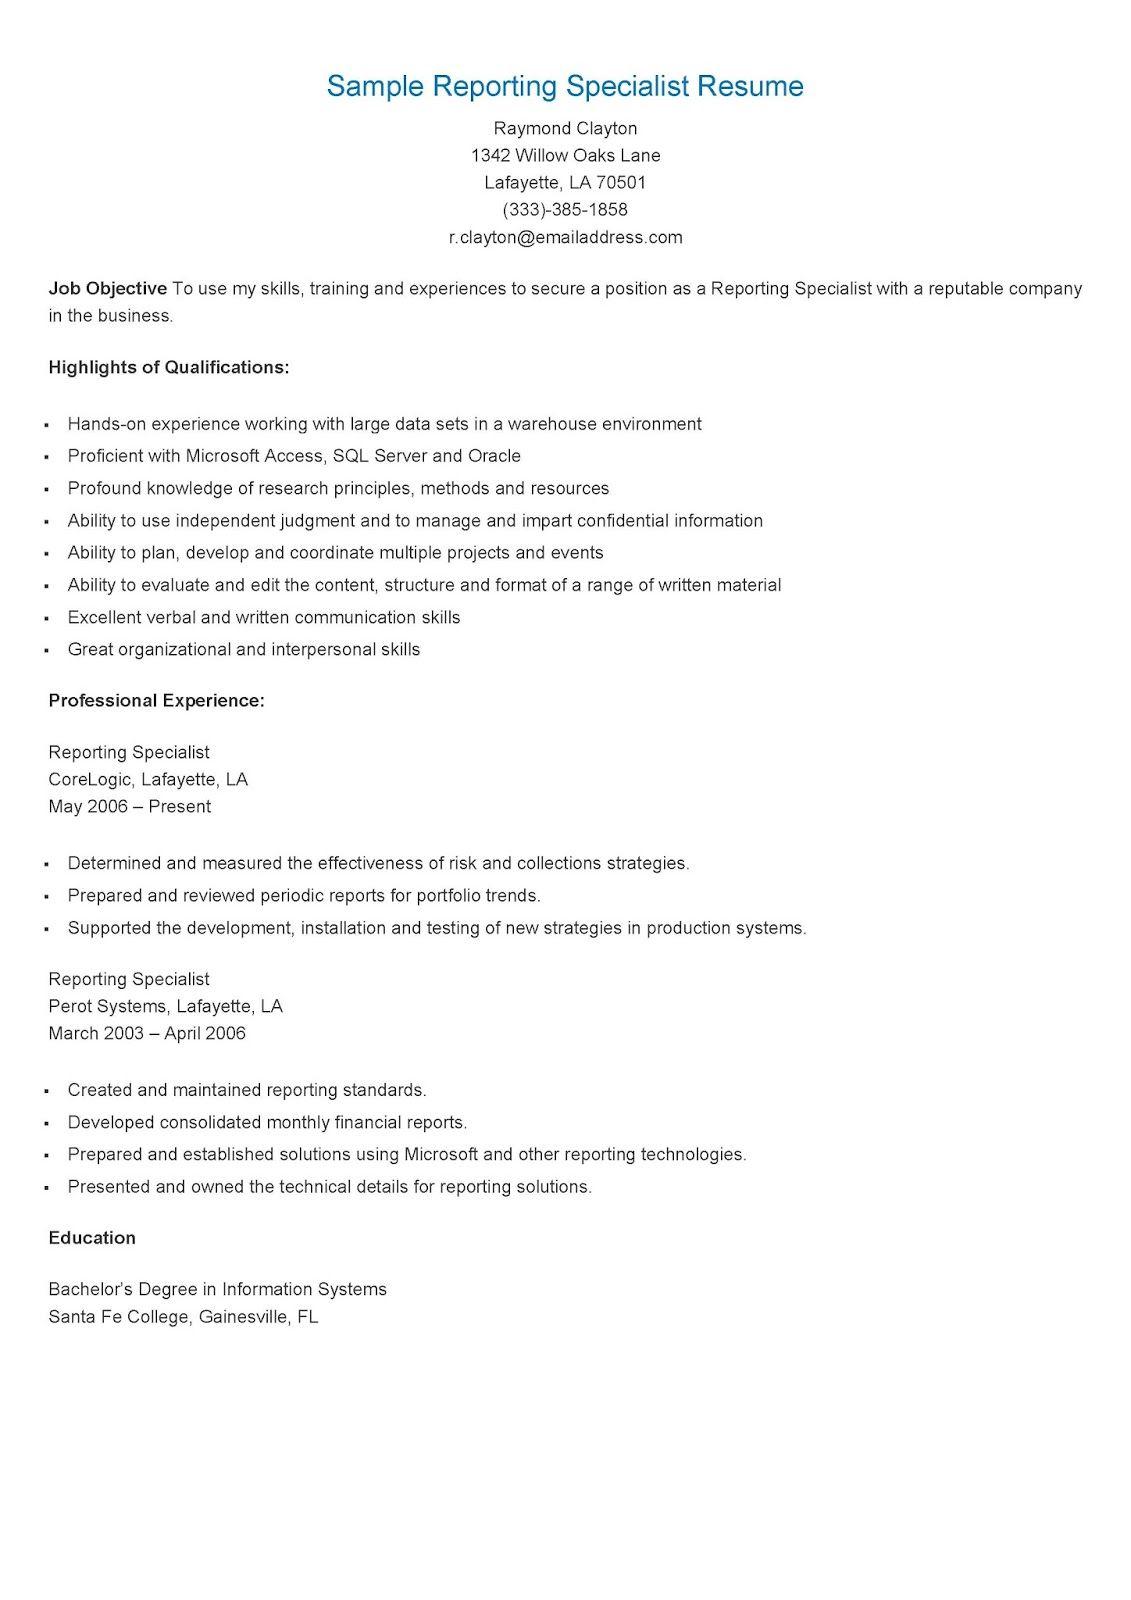 Good Resume Format Reddit